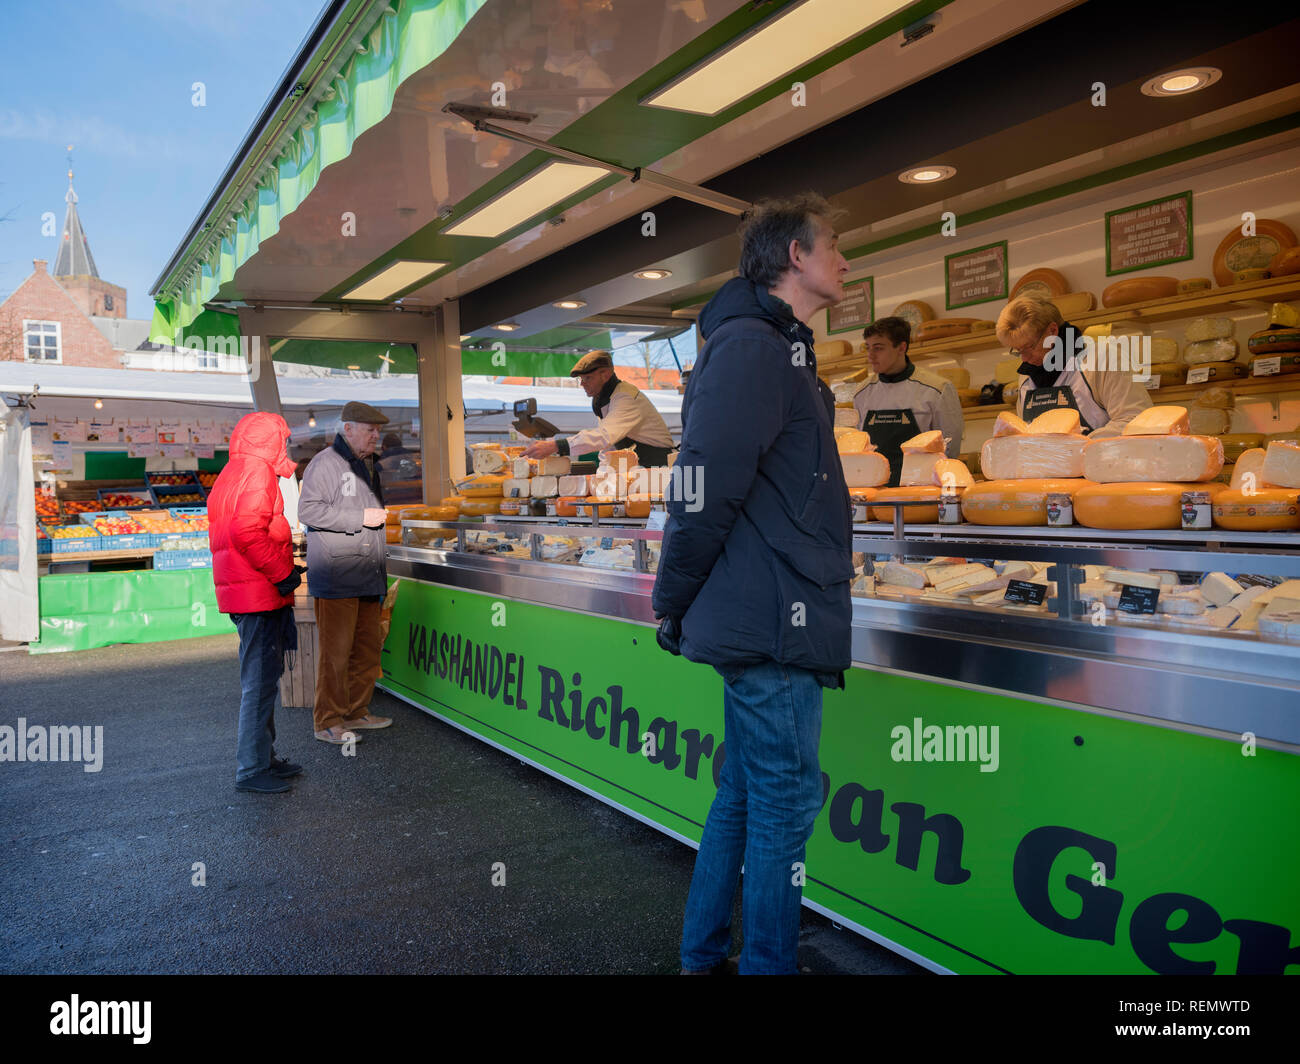 naarden, netherlands, 19 january 2019: people on open air market buy dutch cheese from stall in naarden vesting - Stock Image